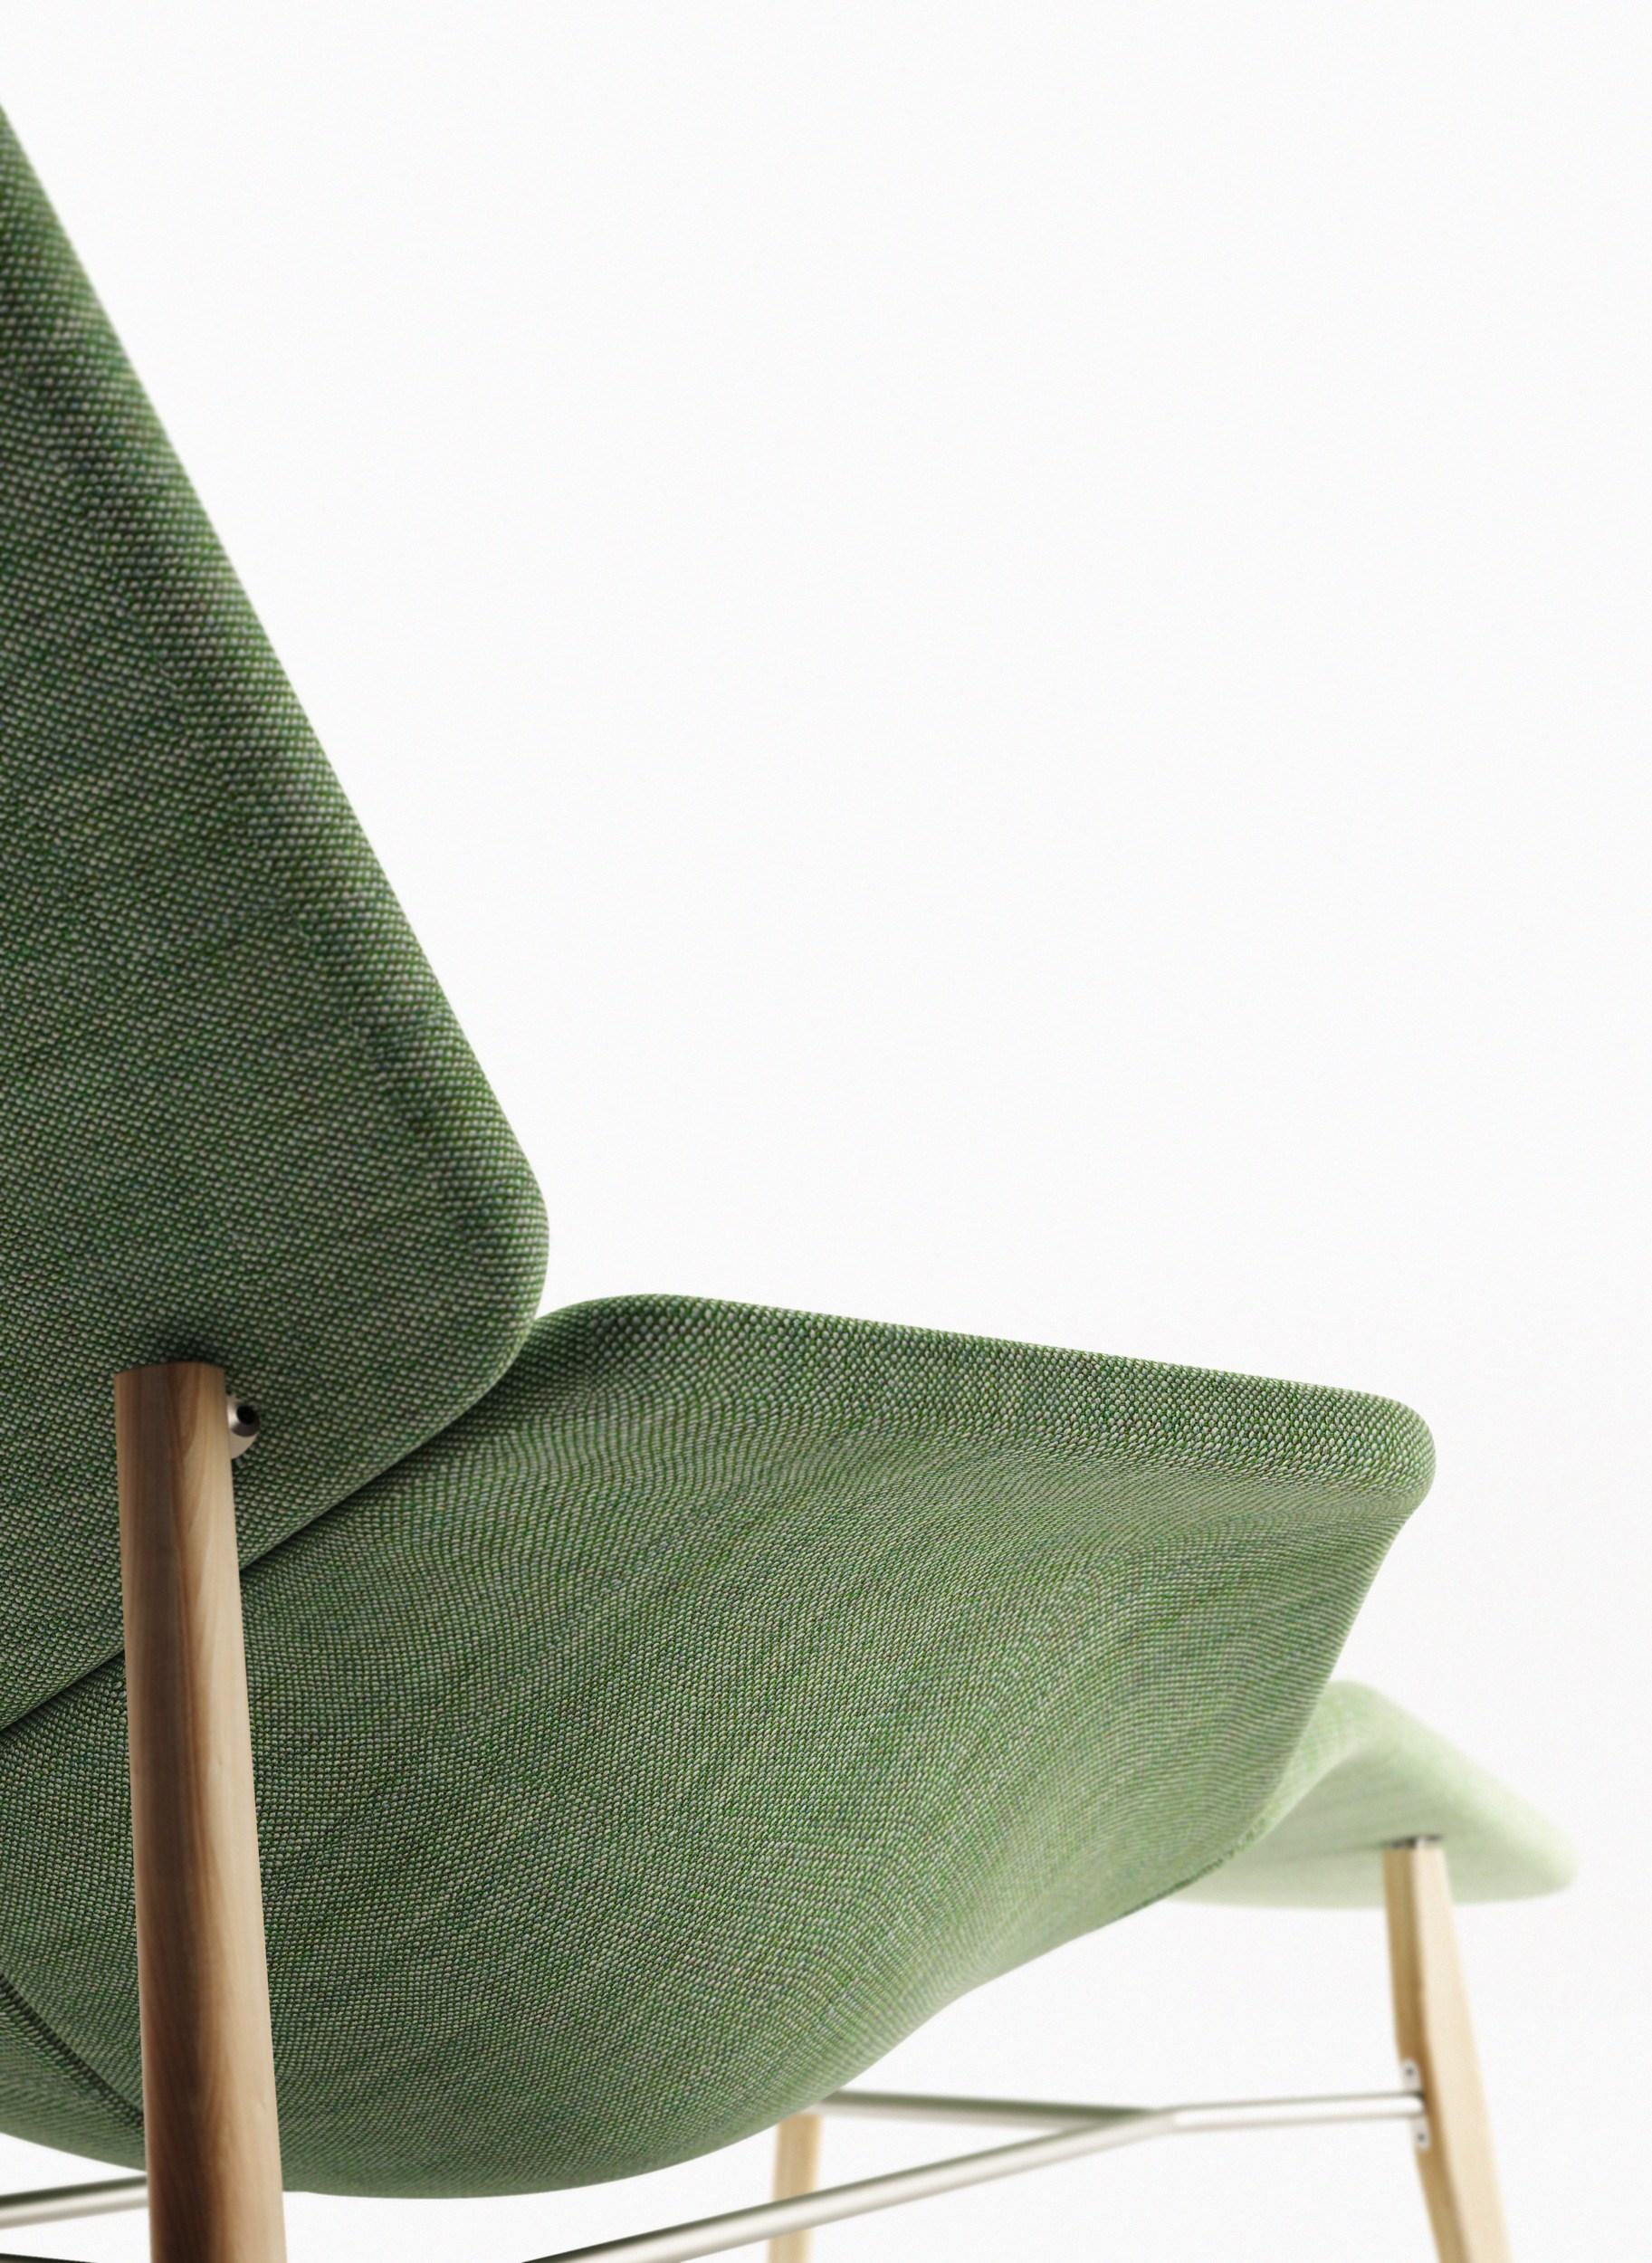 Atoll Chaise Longue by Patrick Norguet for Tacchini Italia